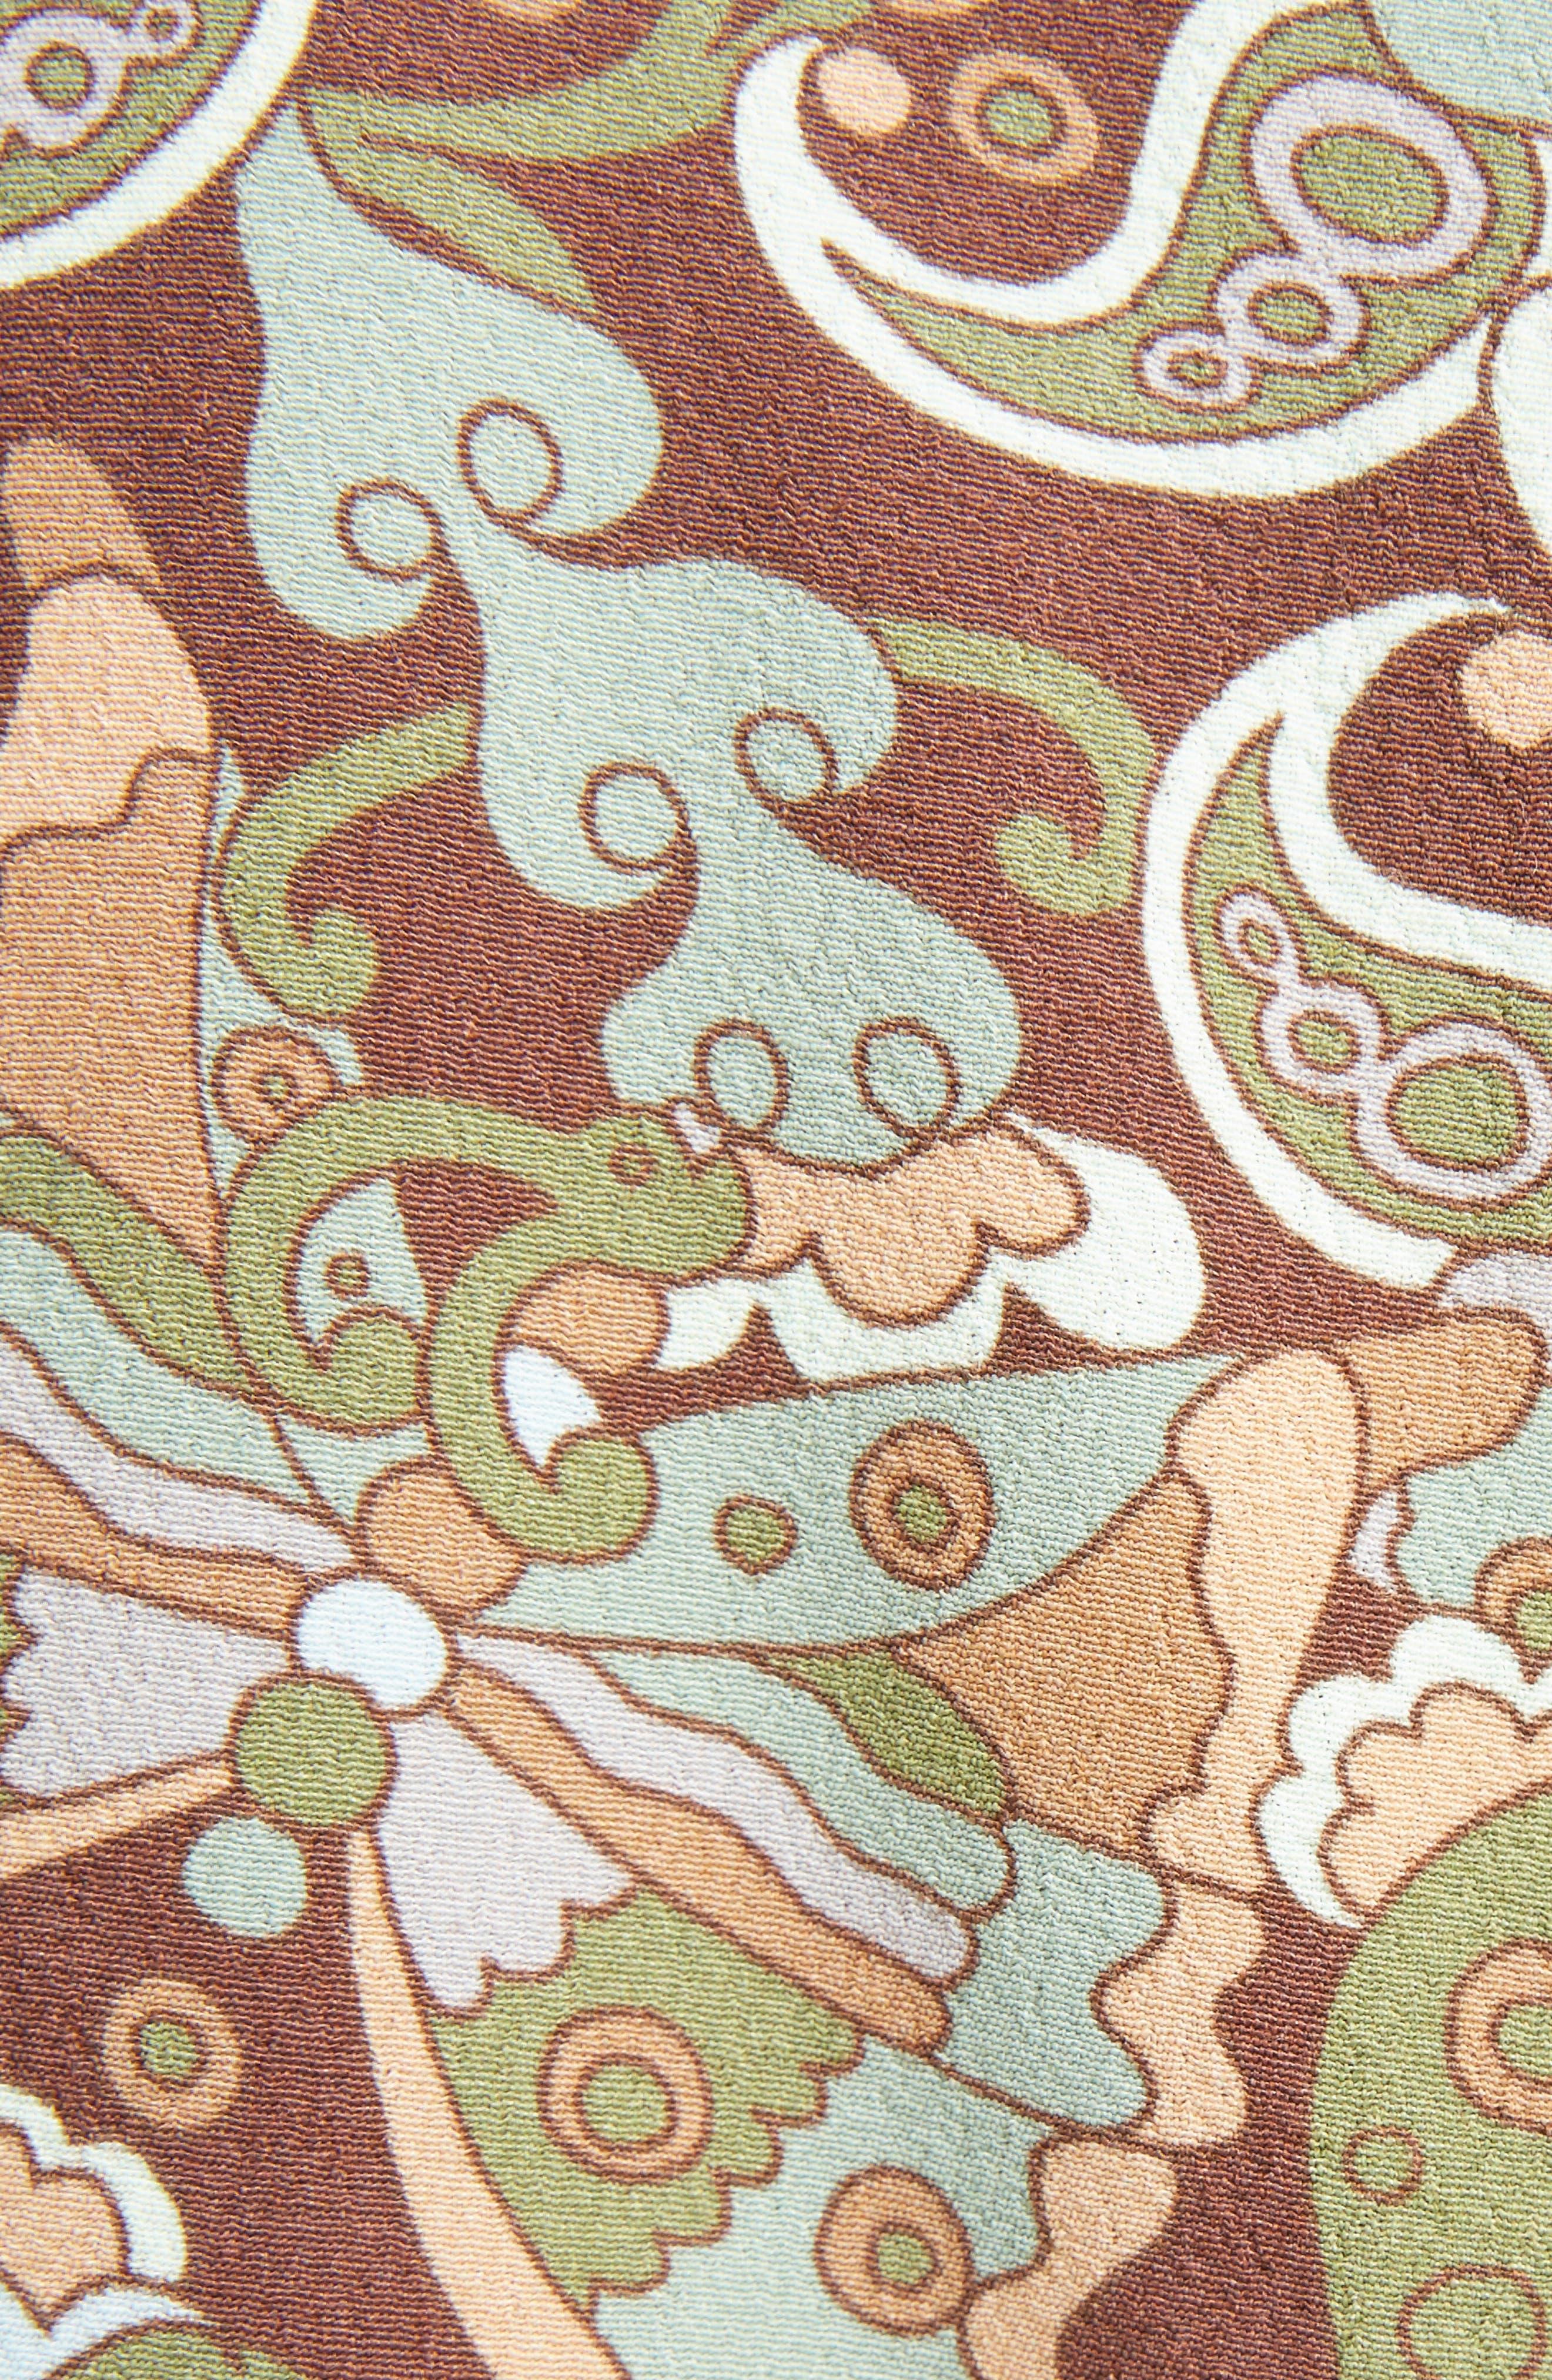 Butterfly Garden Print Crêpe de Chine Dress,                             Alternate thumbnail 5, color,                             Multicolor Brown